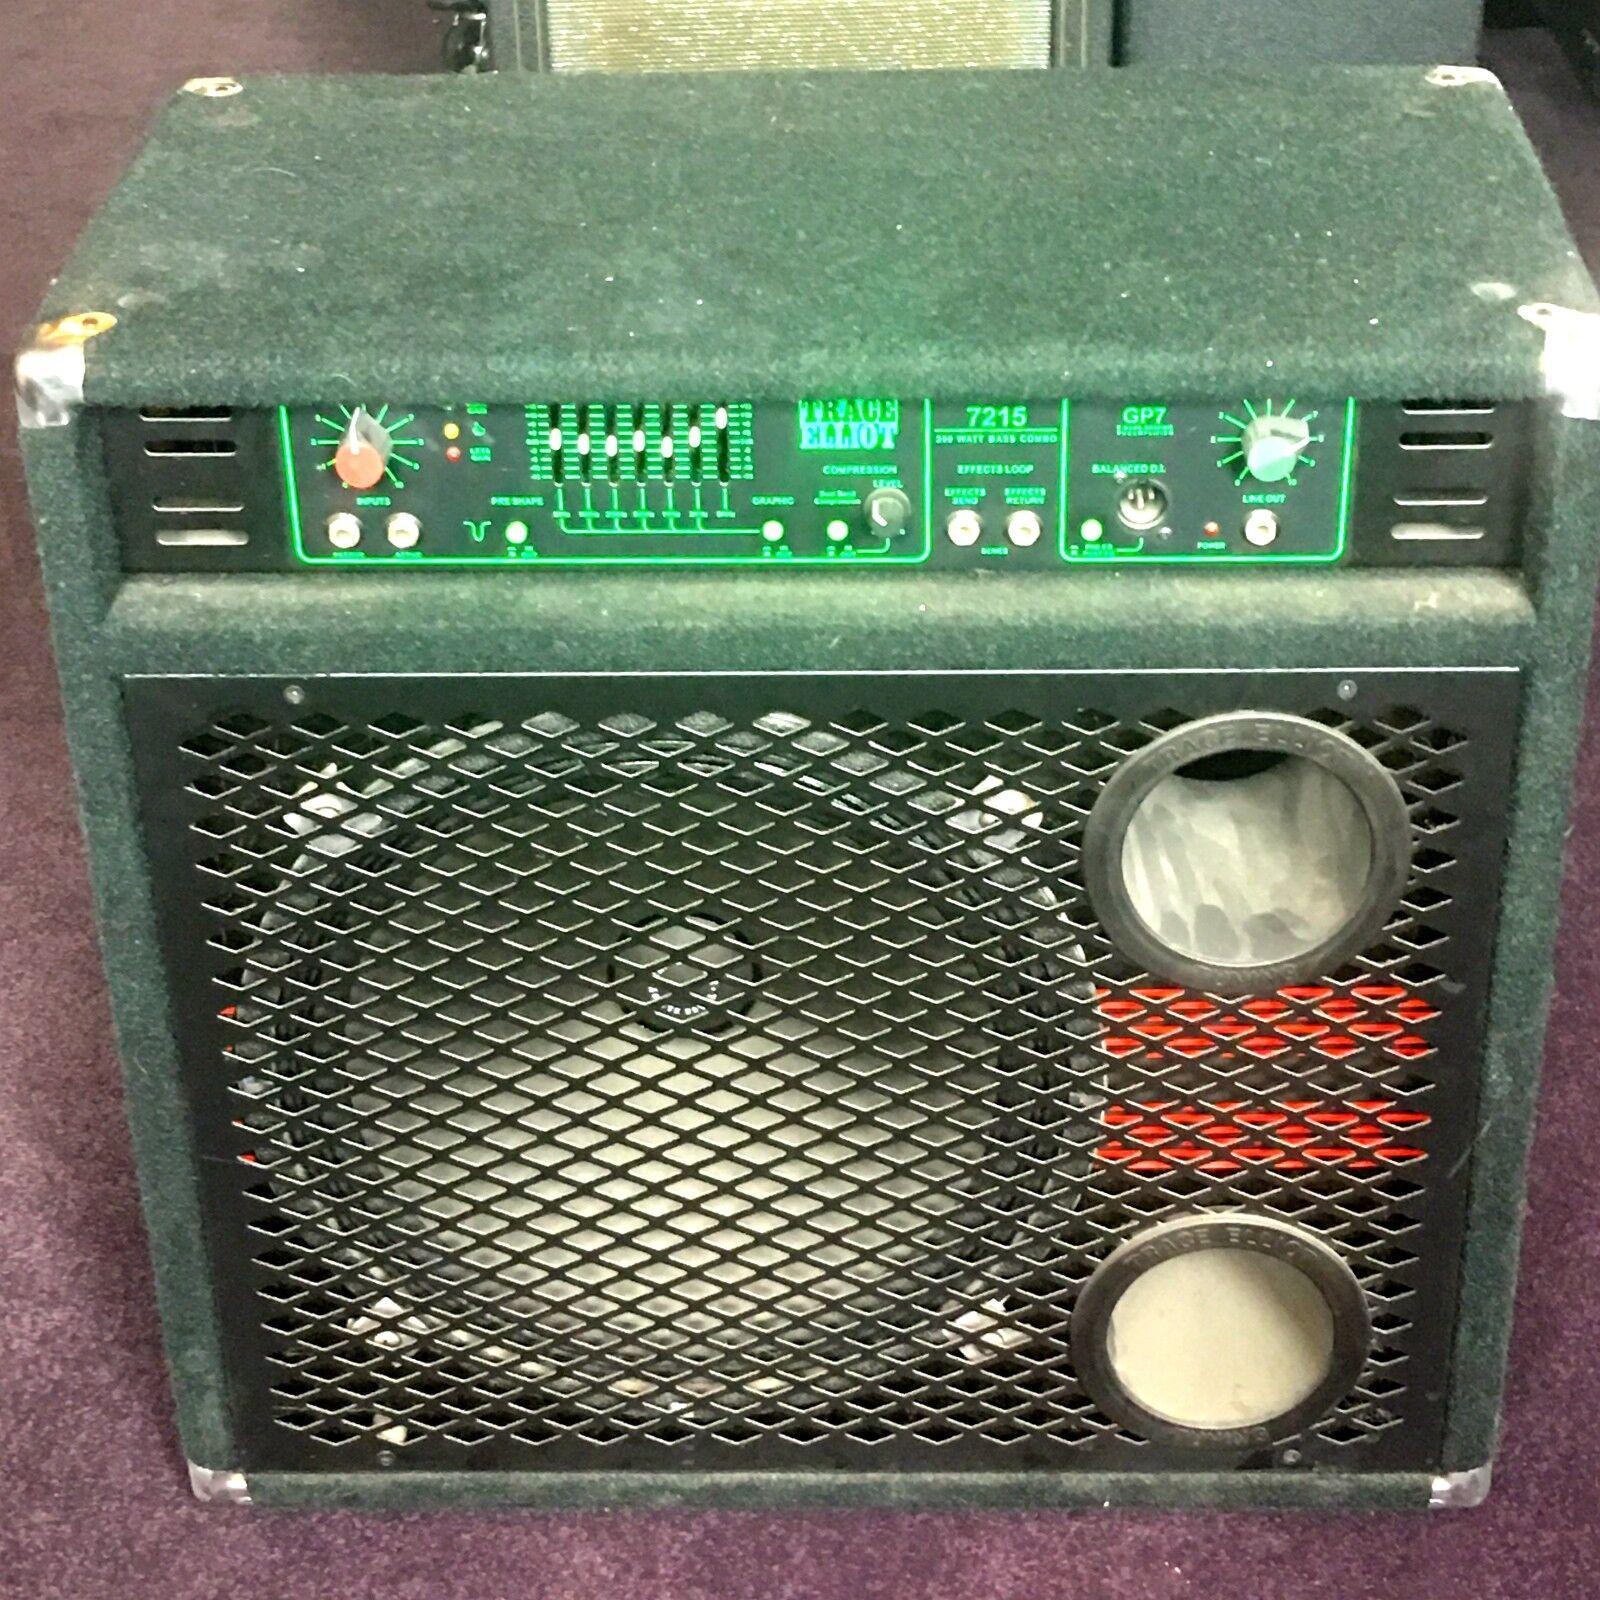 Trace Elliot 7215 300 watt Bass Combo